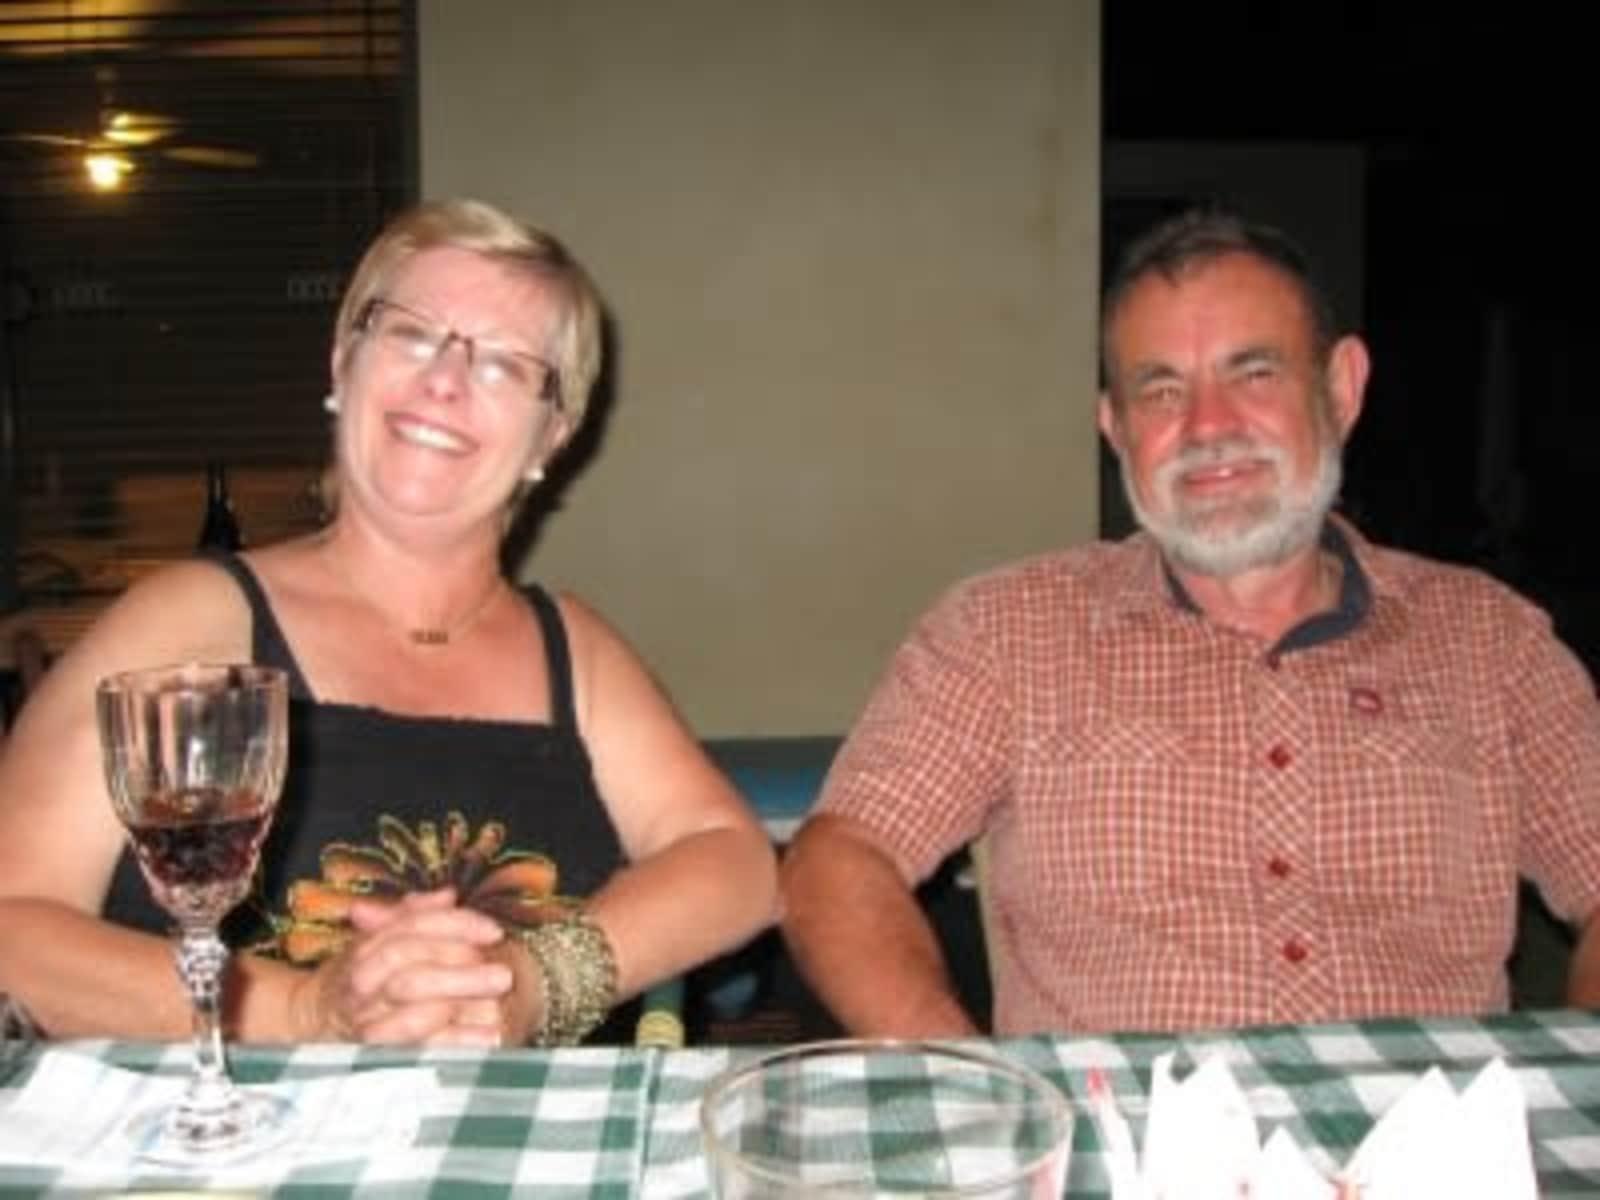 Glenda & Terry from Margaret River, Western Australia, Australia